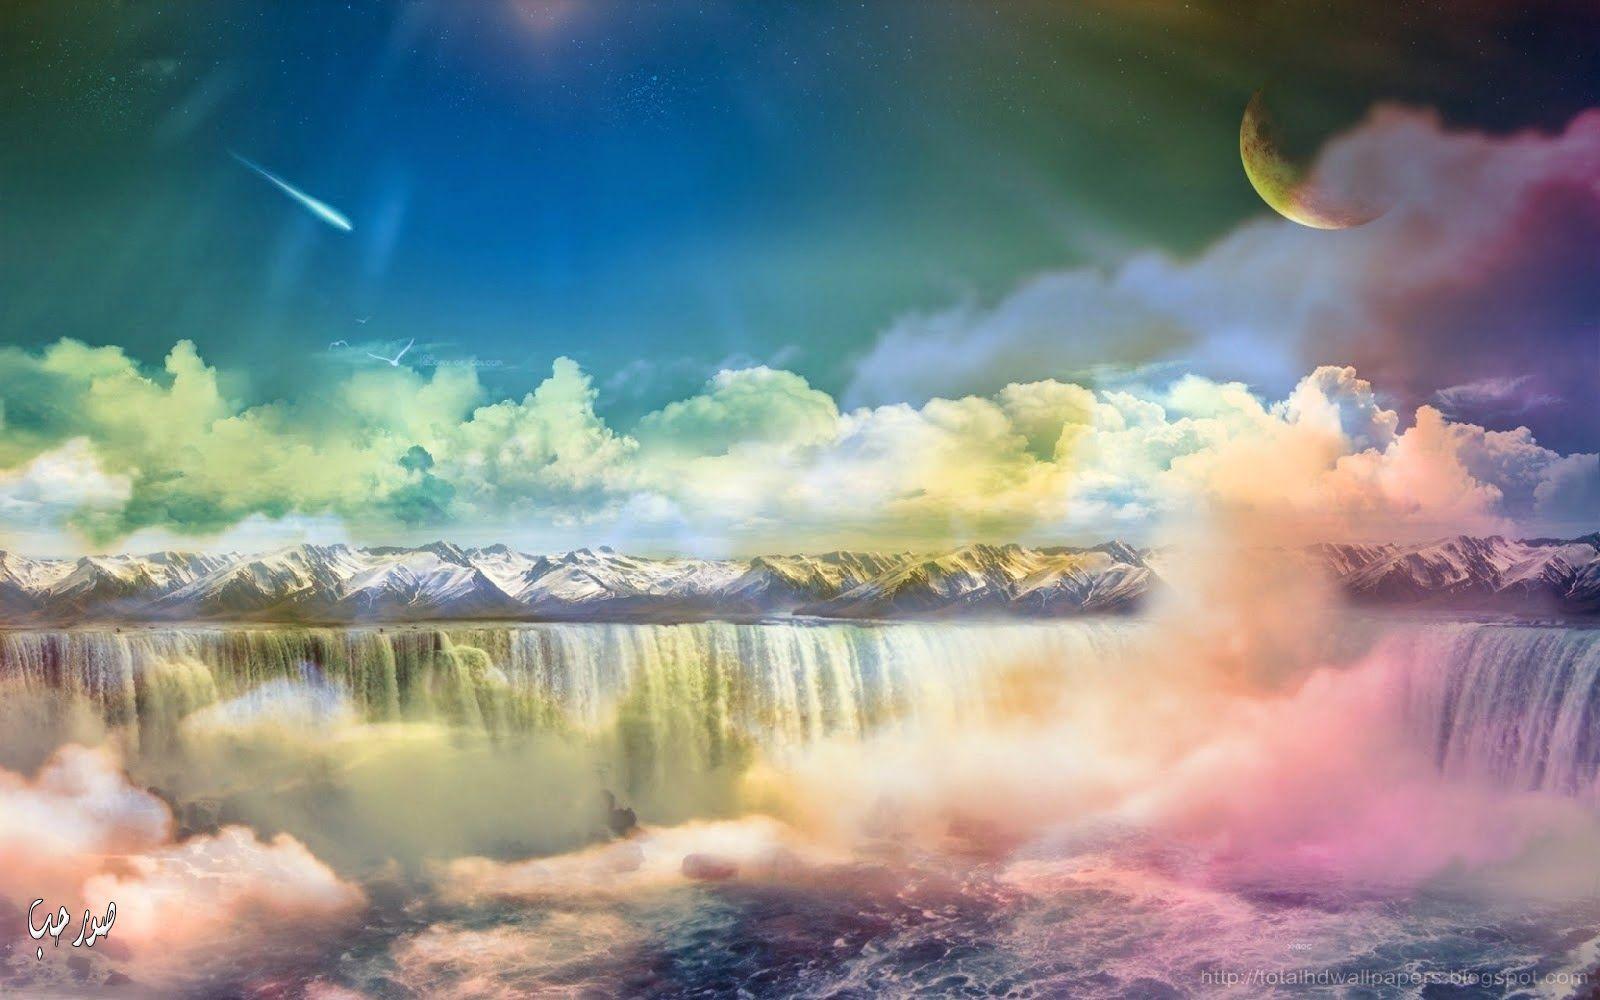 Colourful Fantasy Cloud Backgrounds: صور بورتريهات جميلة مرسومة صور حلوة معبرة 2015